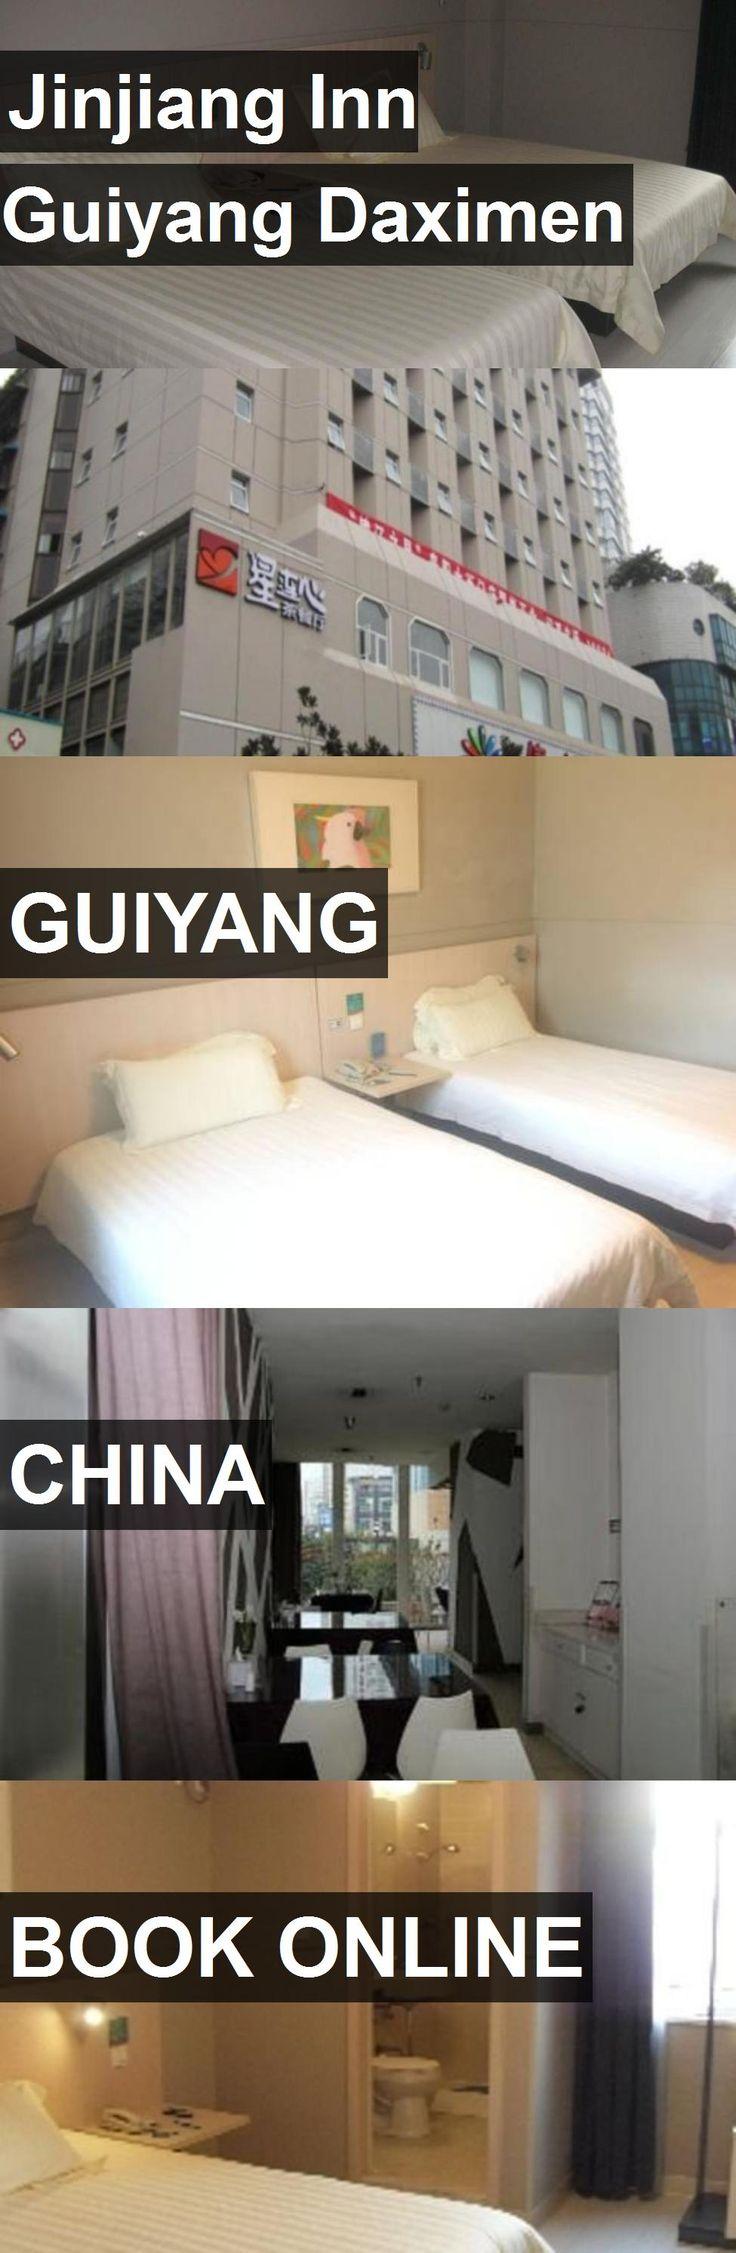 Hotel Jinjiang Inn Guiyang Daximen in Guiyang, China. For more information, photos, reviews and best prices please follow the link. #China #Guiyang #travel #vacation #hotel